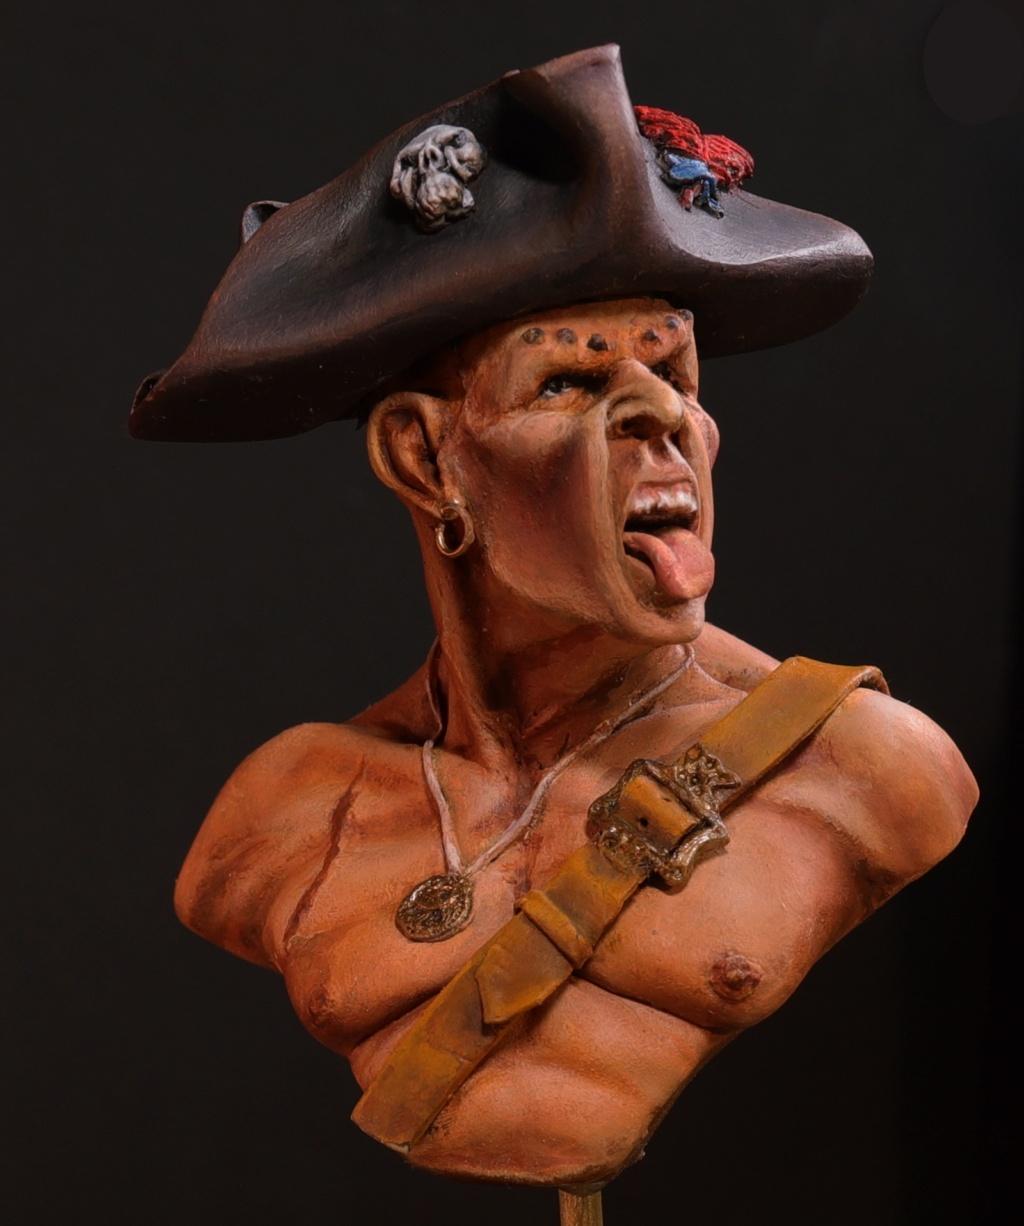 Pirate des caraïbes - Définitif Pirate19